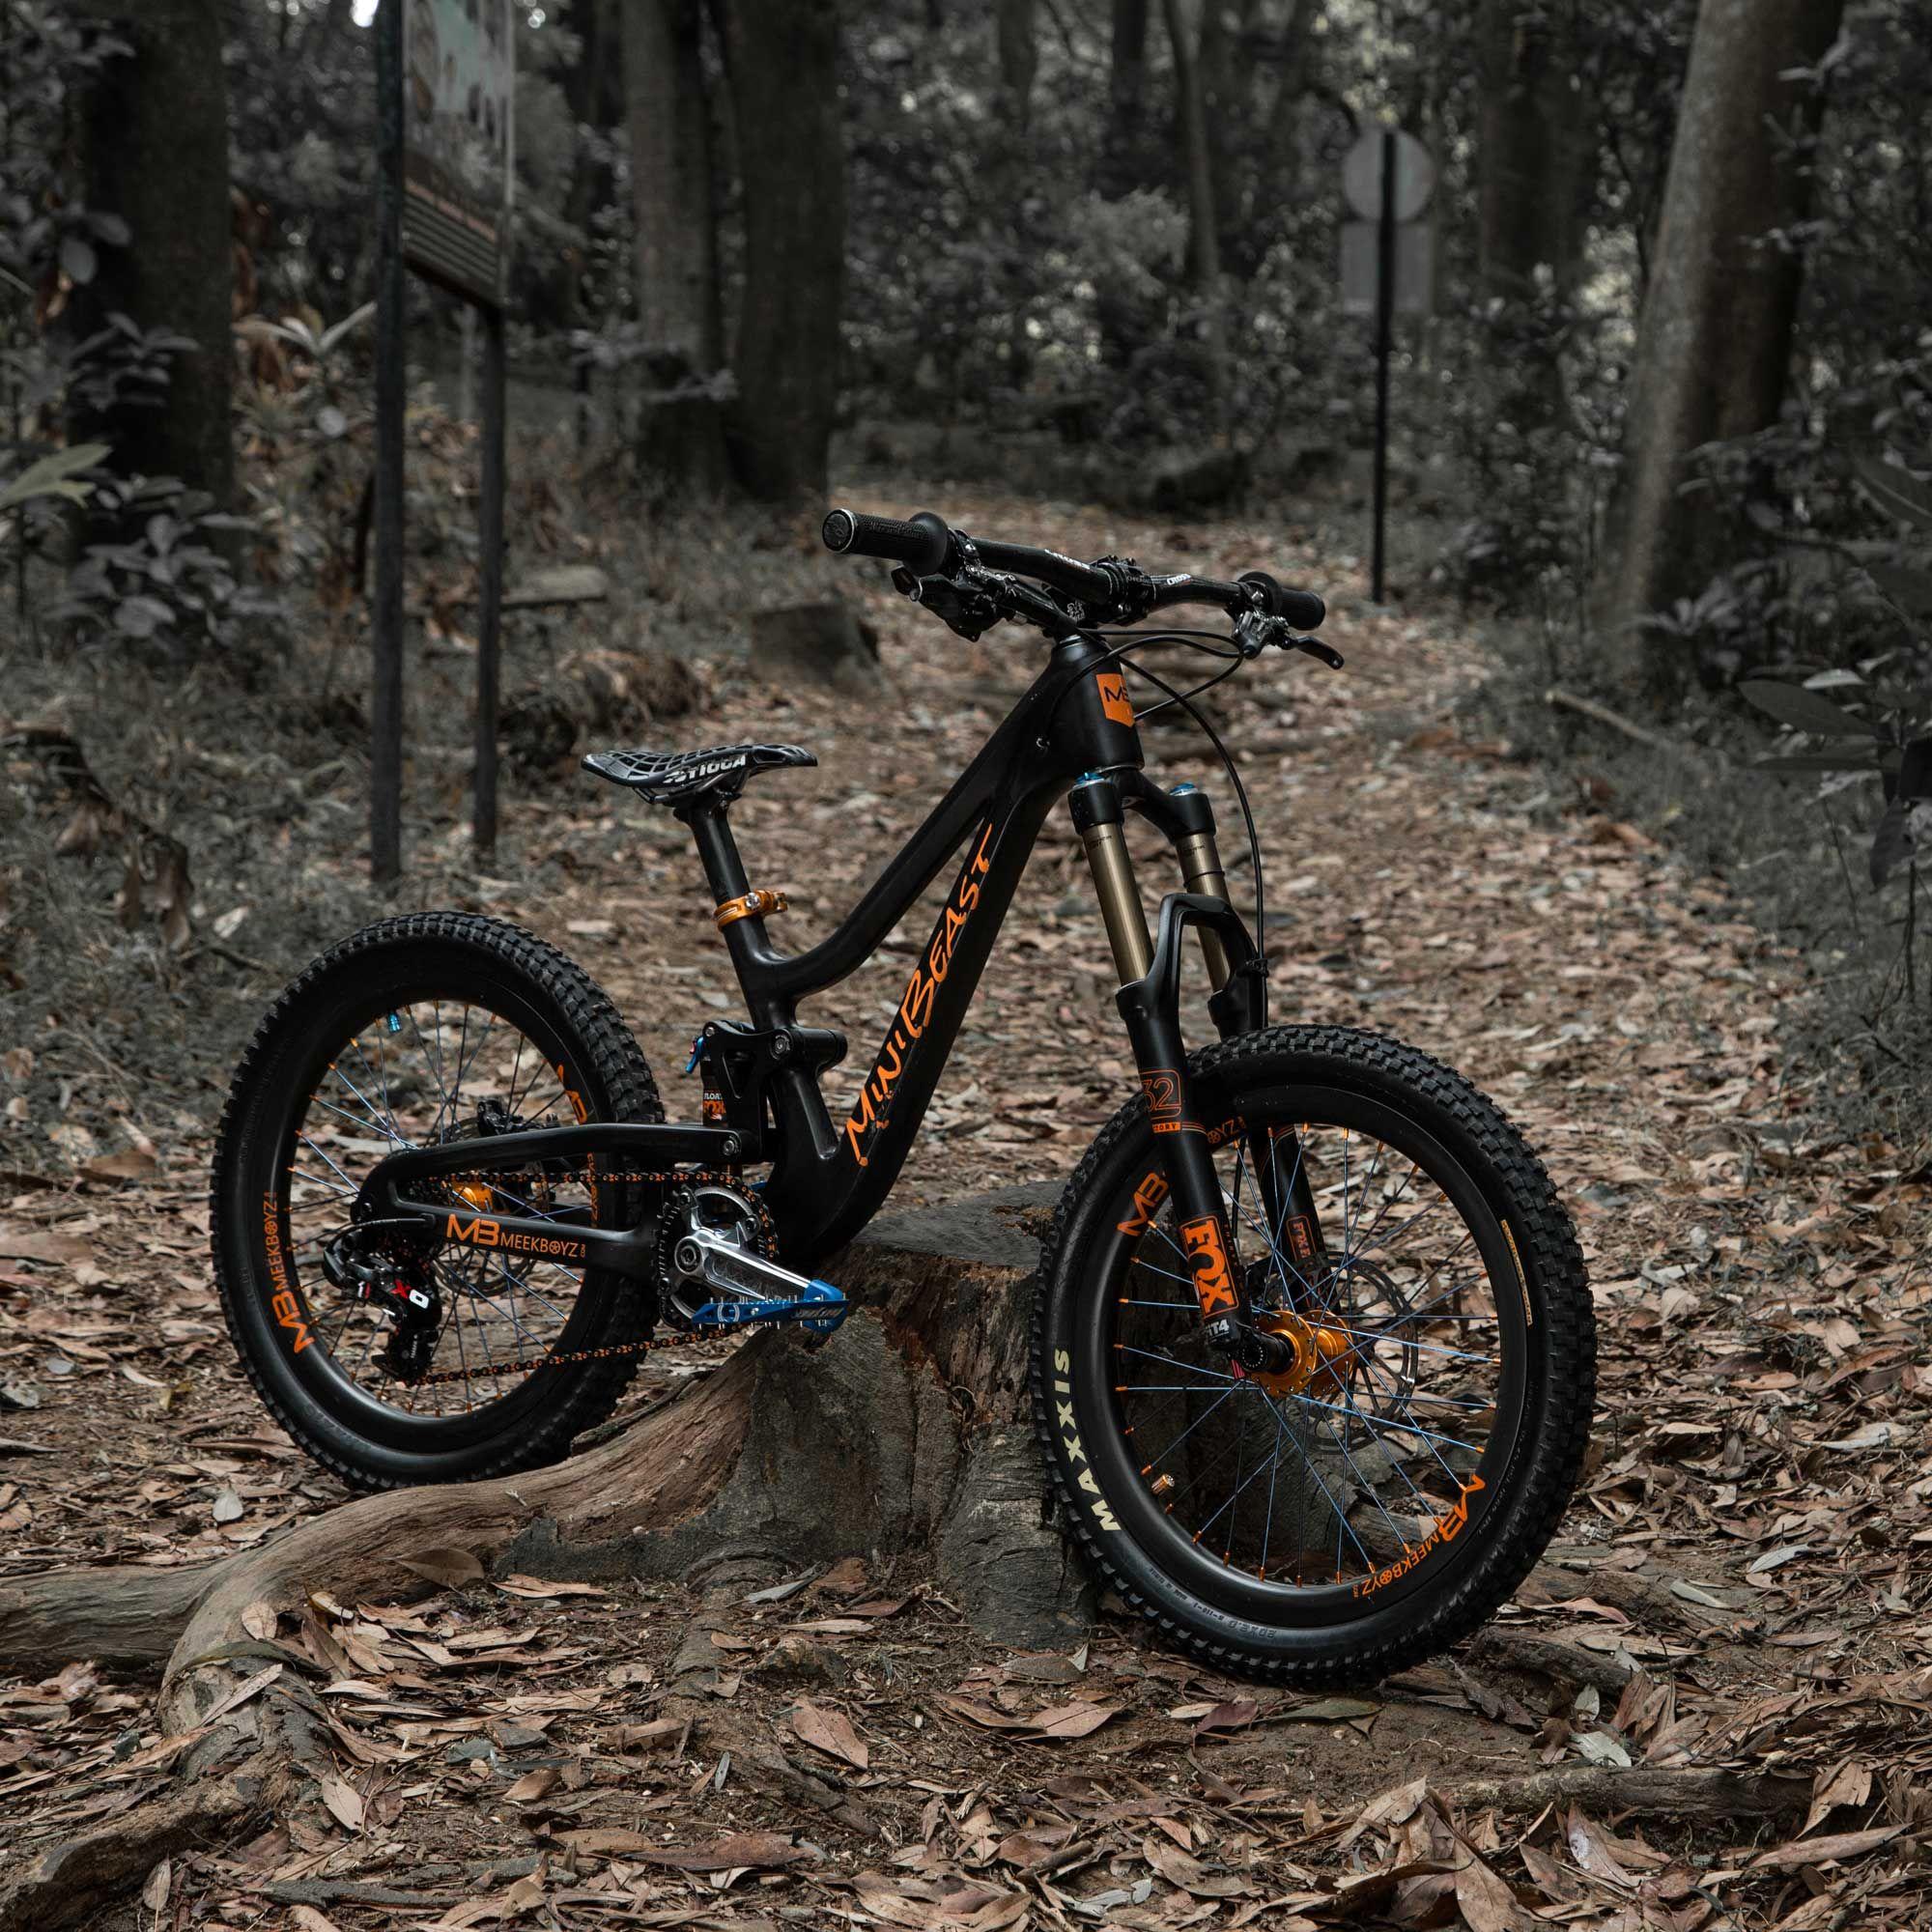 Top 10 Best Mountain Bike Under 200 In 2019 Best Mountain Bikes Suspension Bike Best Cheap Mountain Bike